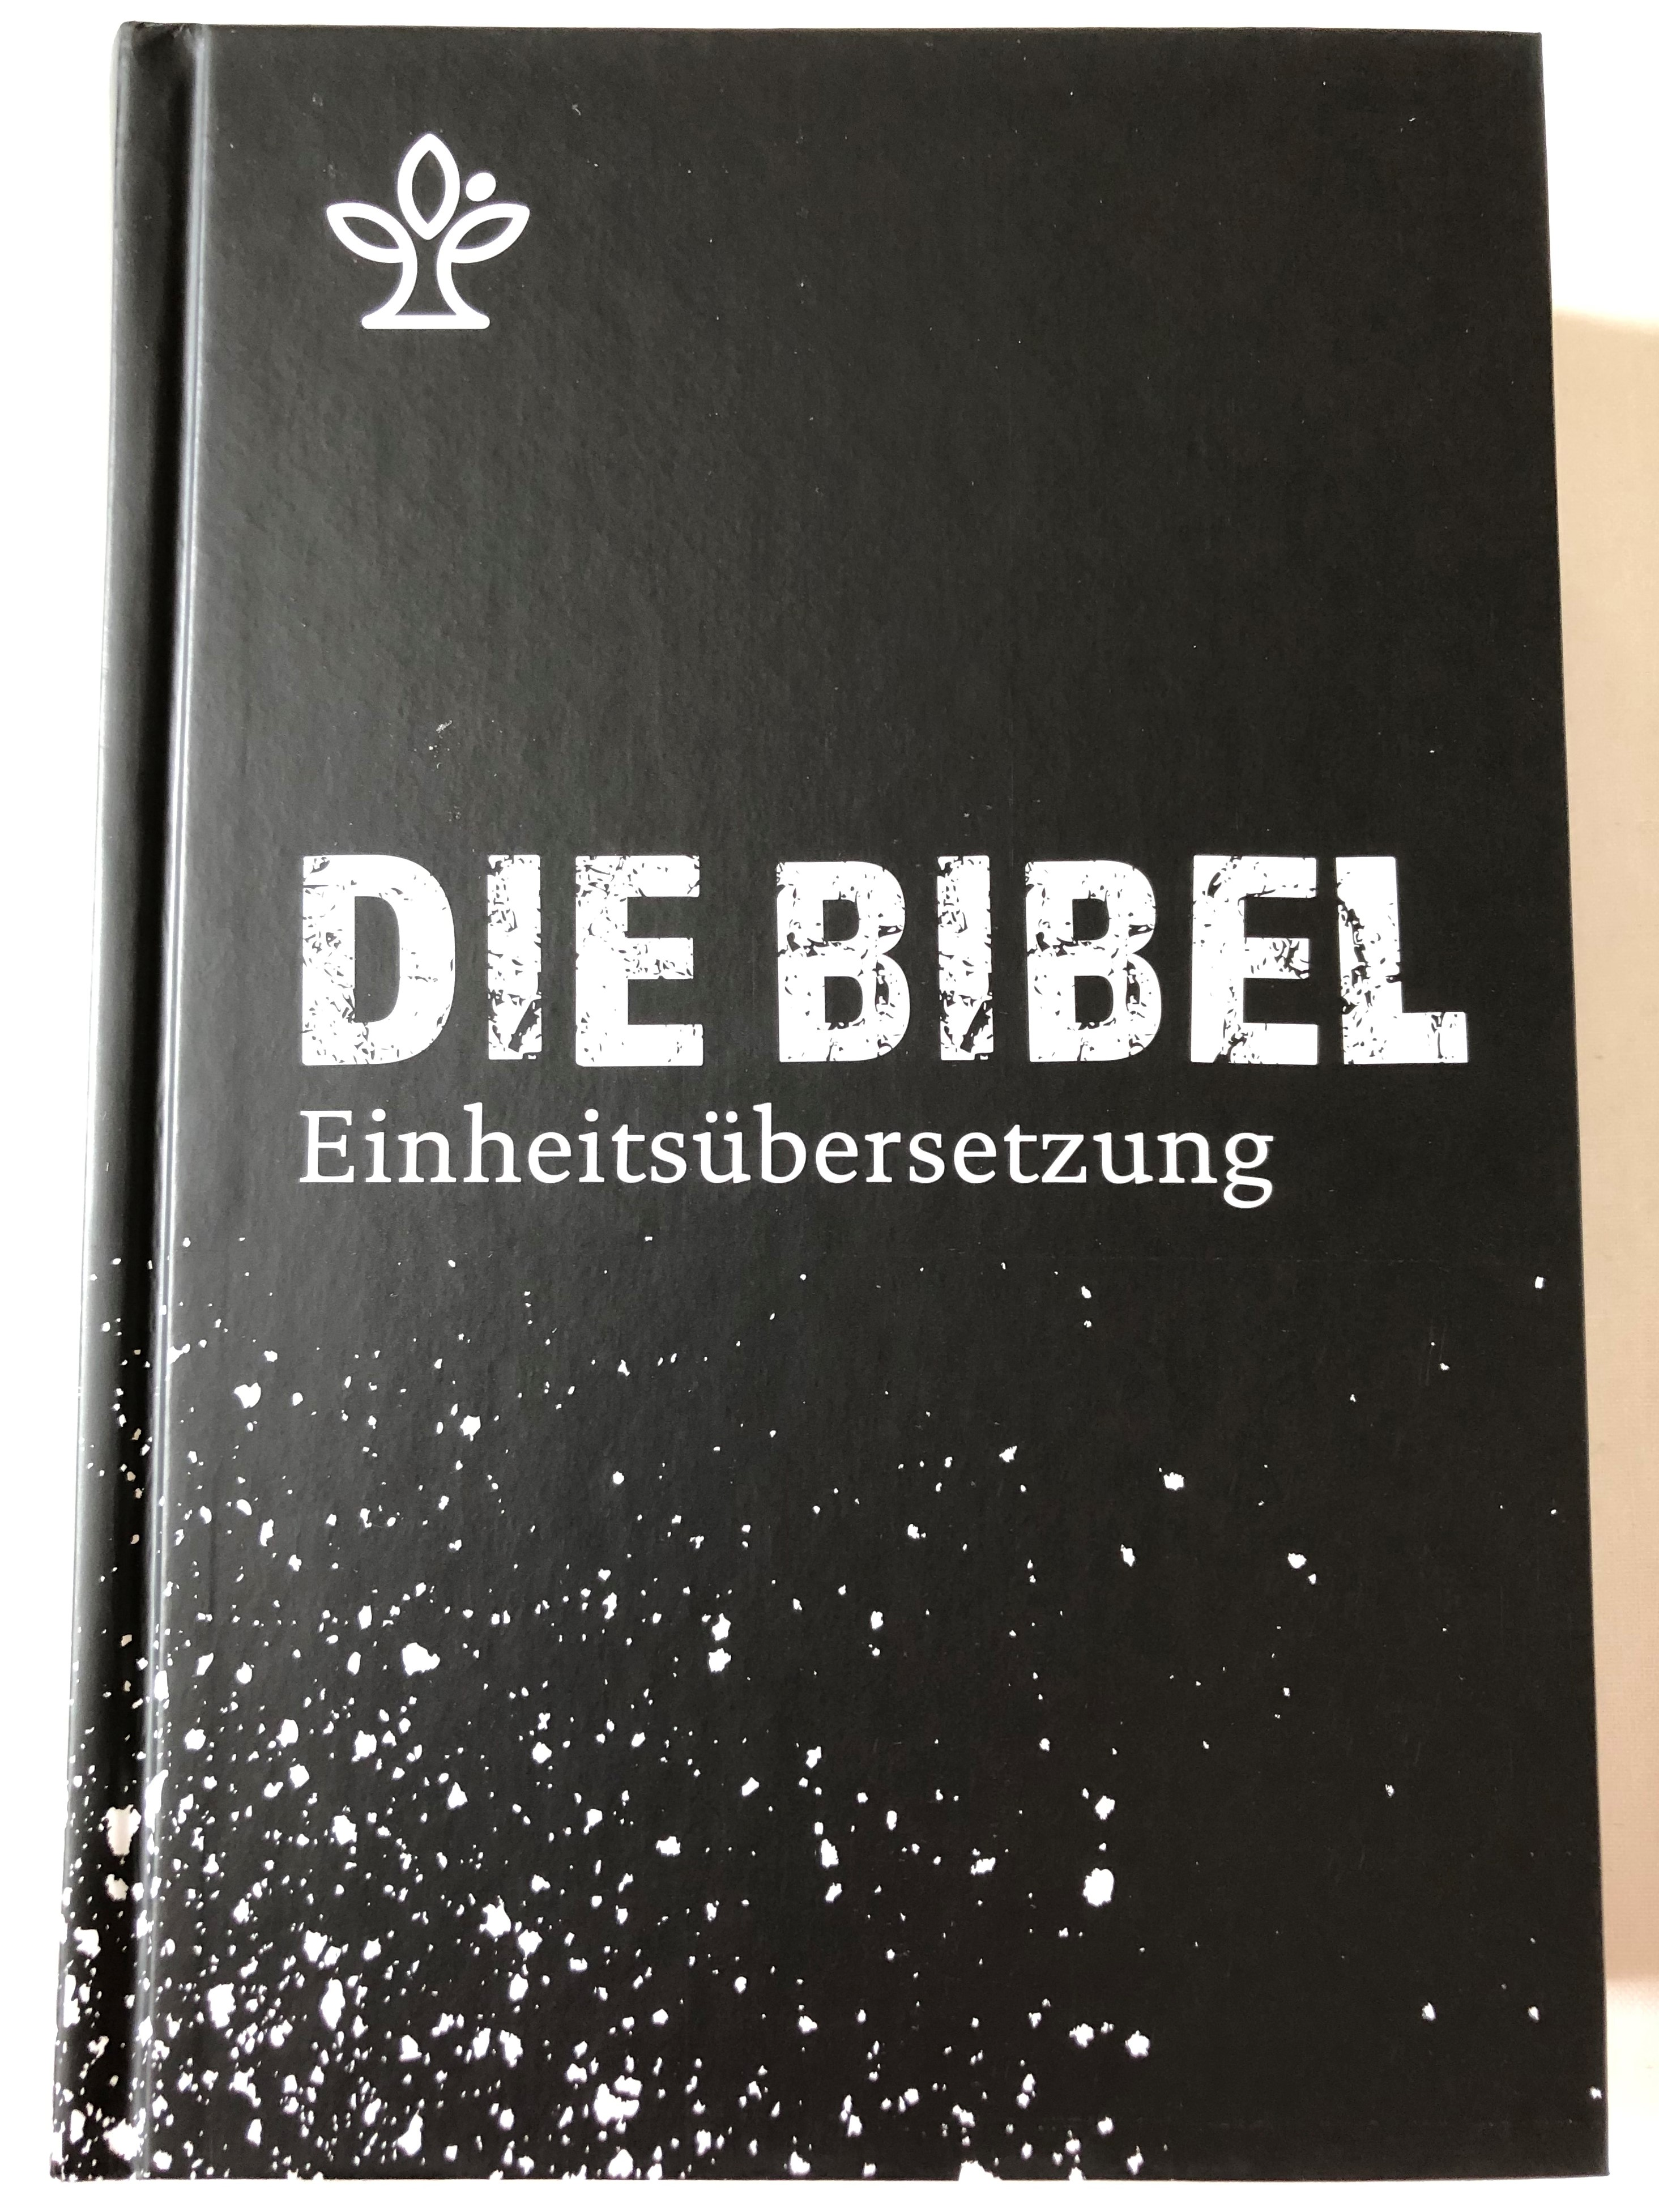 die-bibel-einheits-bersetzung-german-language-holy-bible-unitary-translation-contains-deuterocanonical-books-apocrypha-hardcover-2016-kbw-1-.jpg